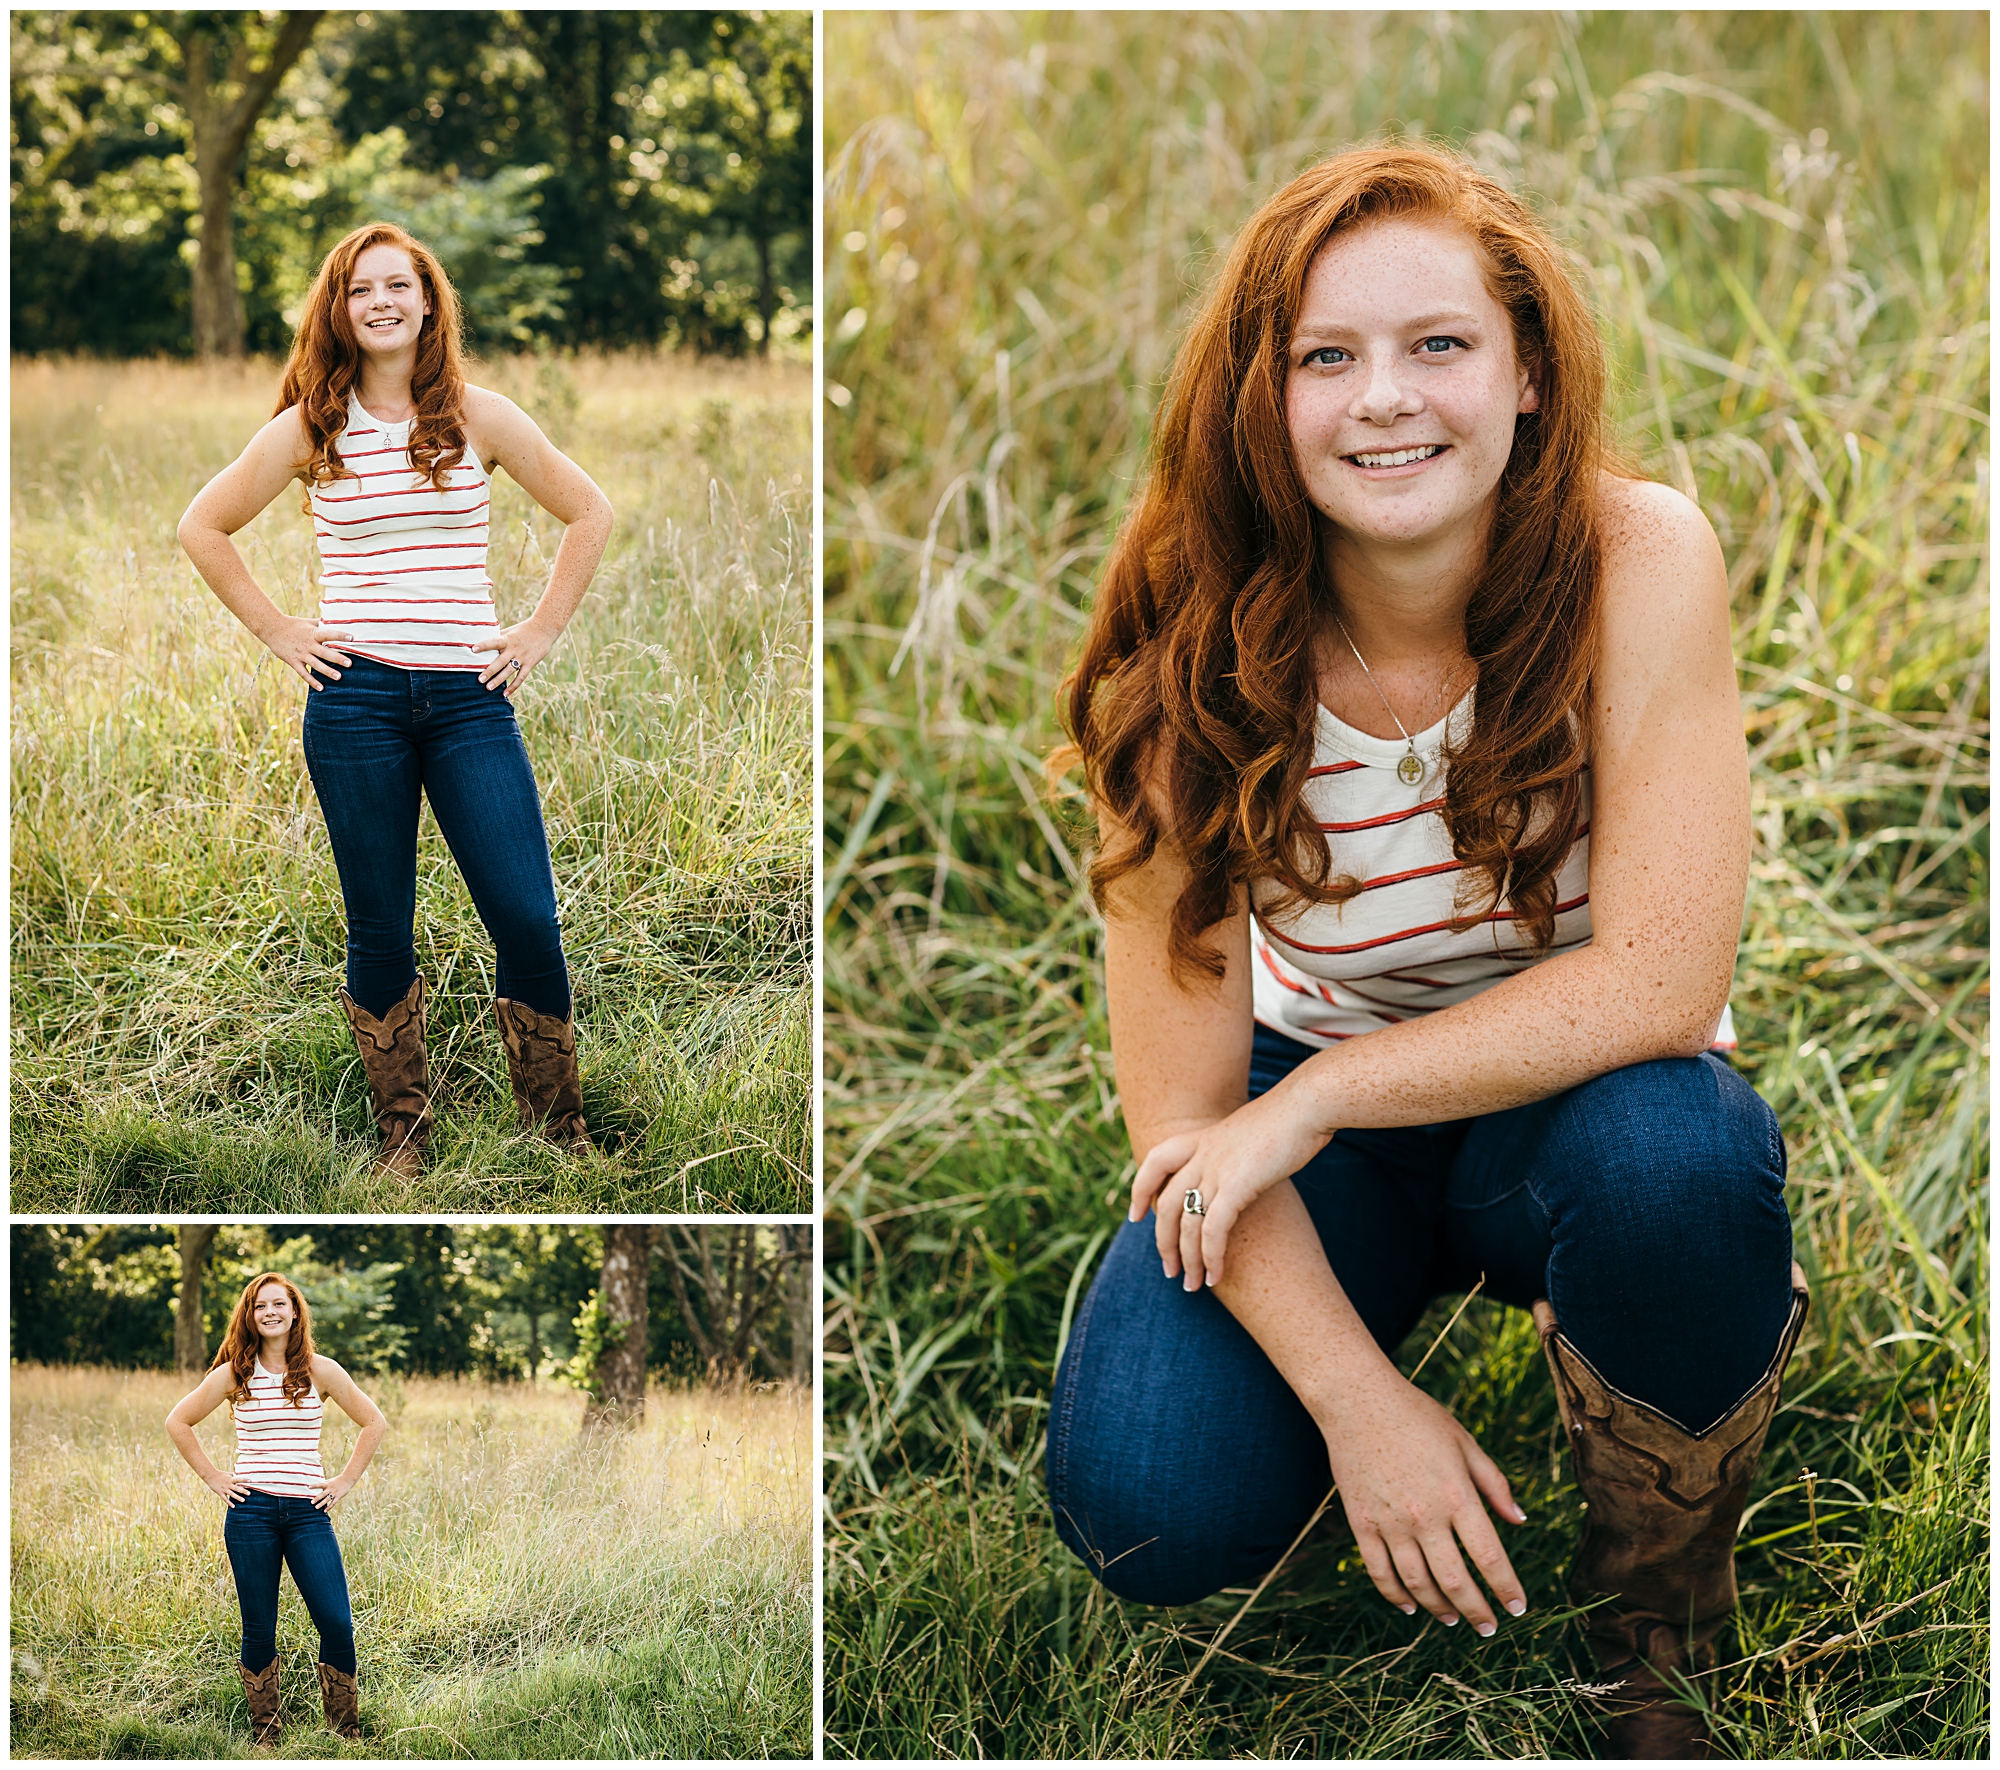 High School Senior girl posing for portraits in the grass at Manassas Battlefield